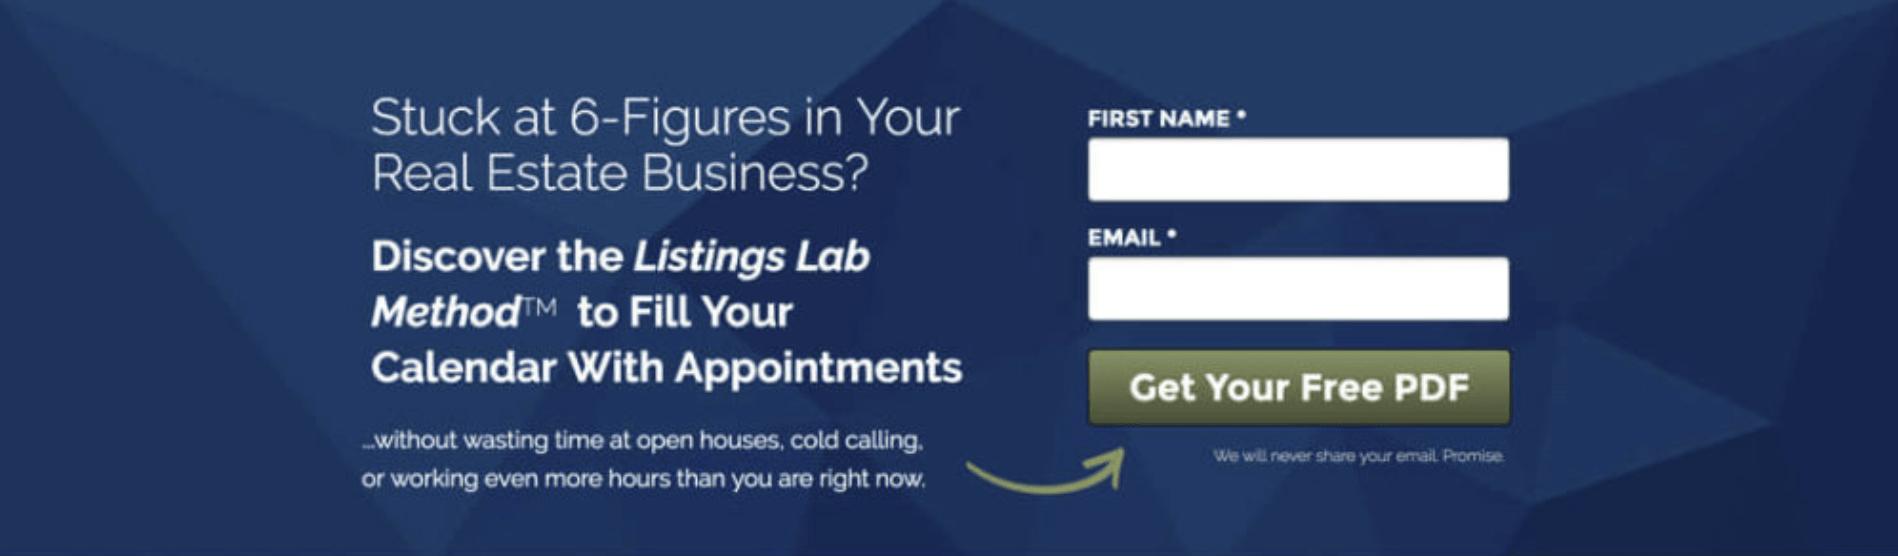 Landing Page Headlines - Listings Lab